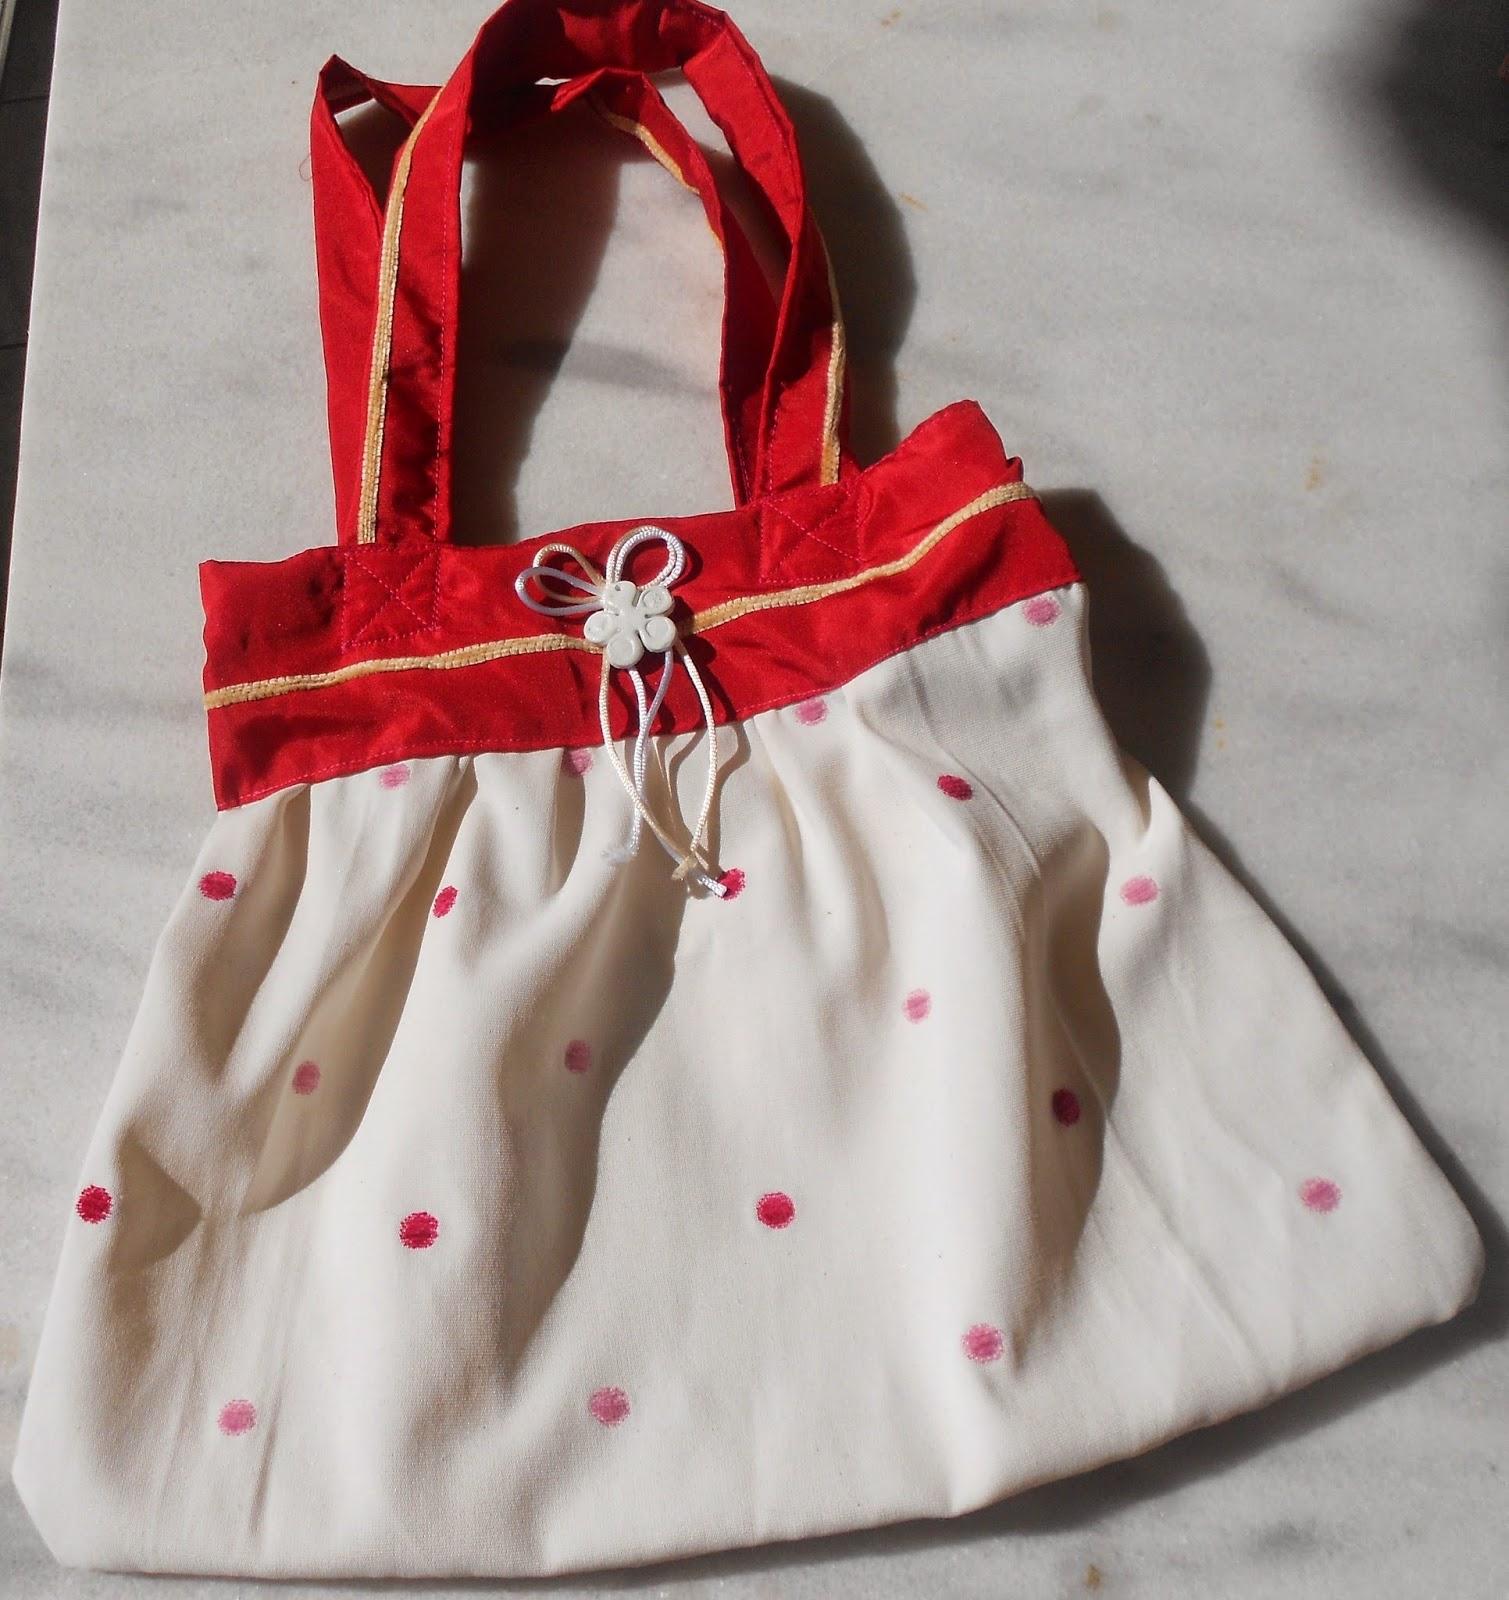 4f72d60865 Εκτυφλωτικός ήλιος!!!!! - Handmade by Maria Nikol